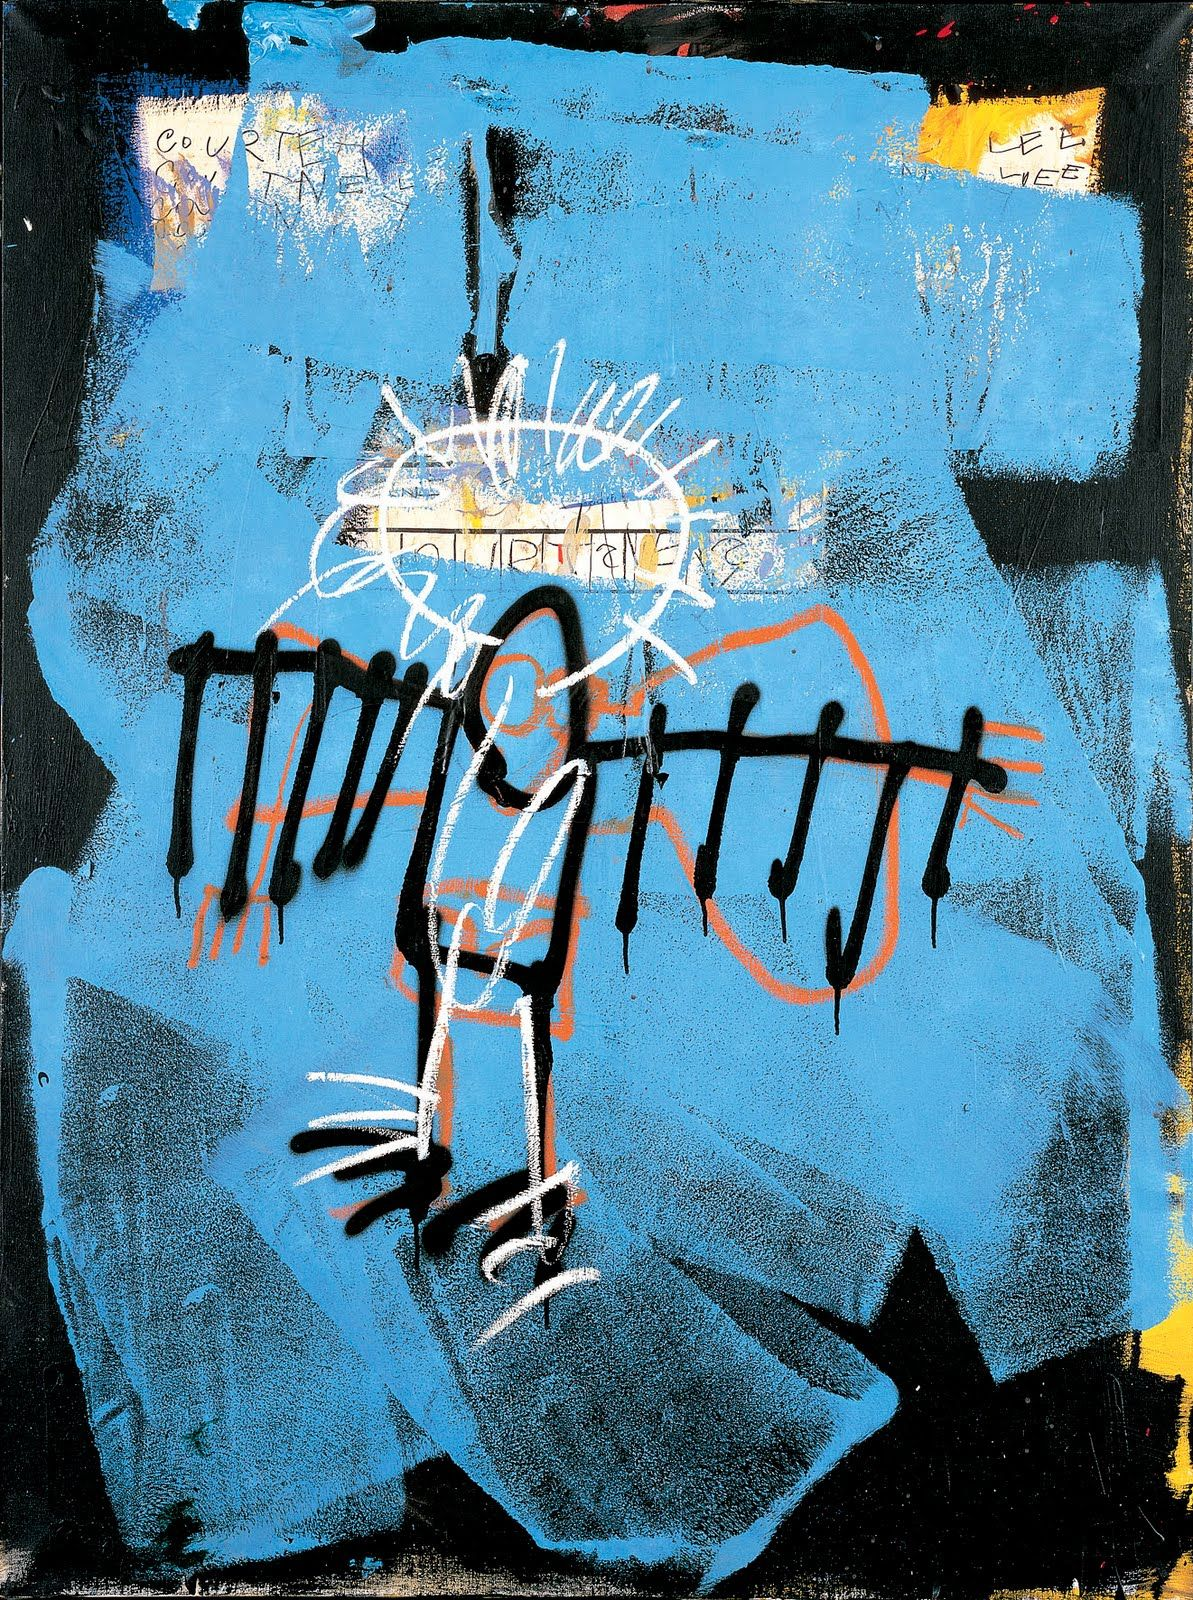 Jean-Michel+Basquiat+3.jpg (1193×1600)